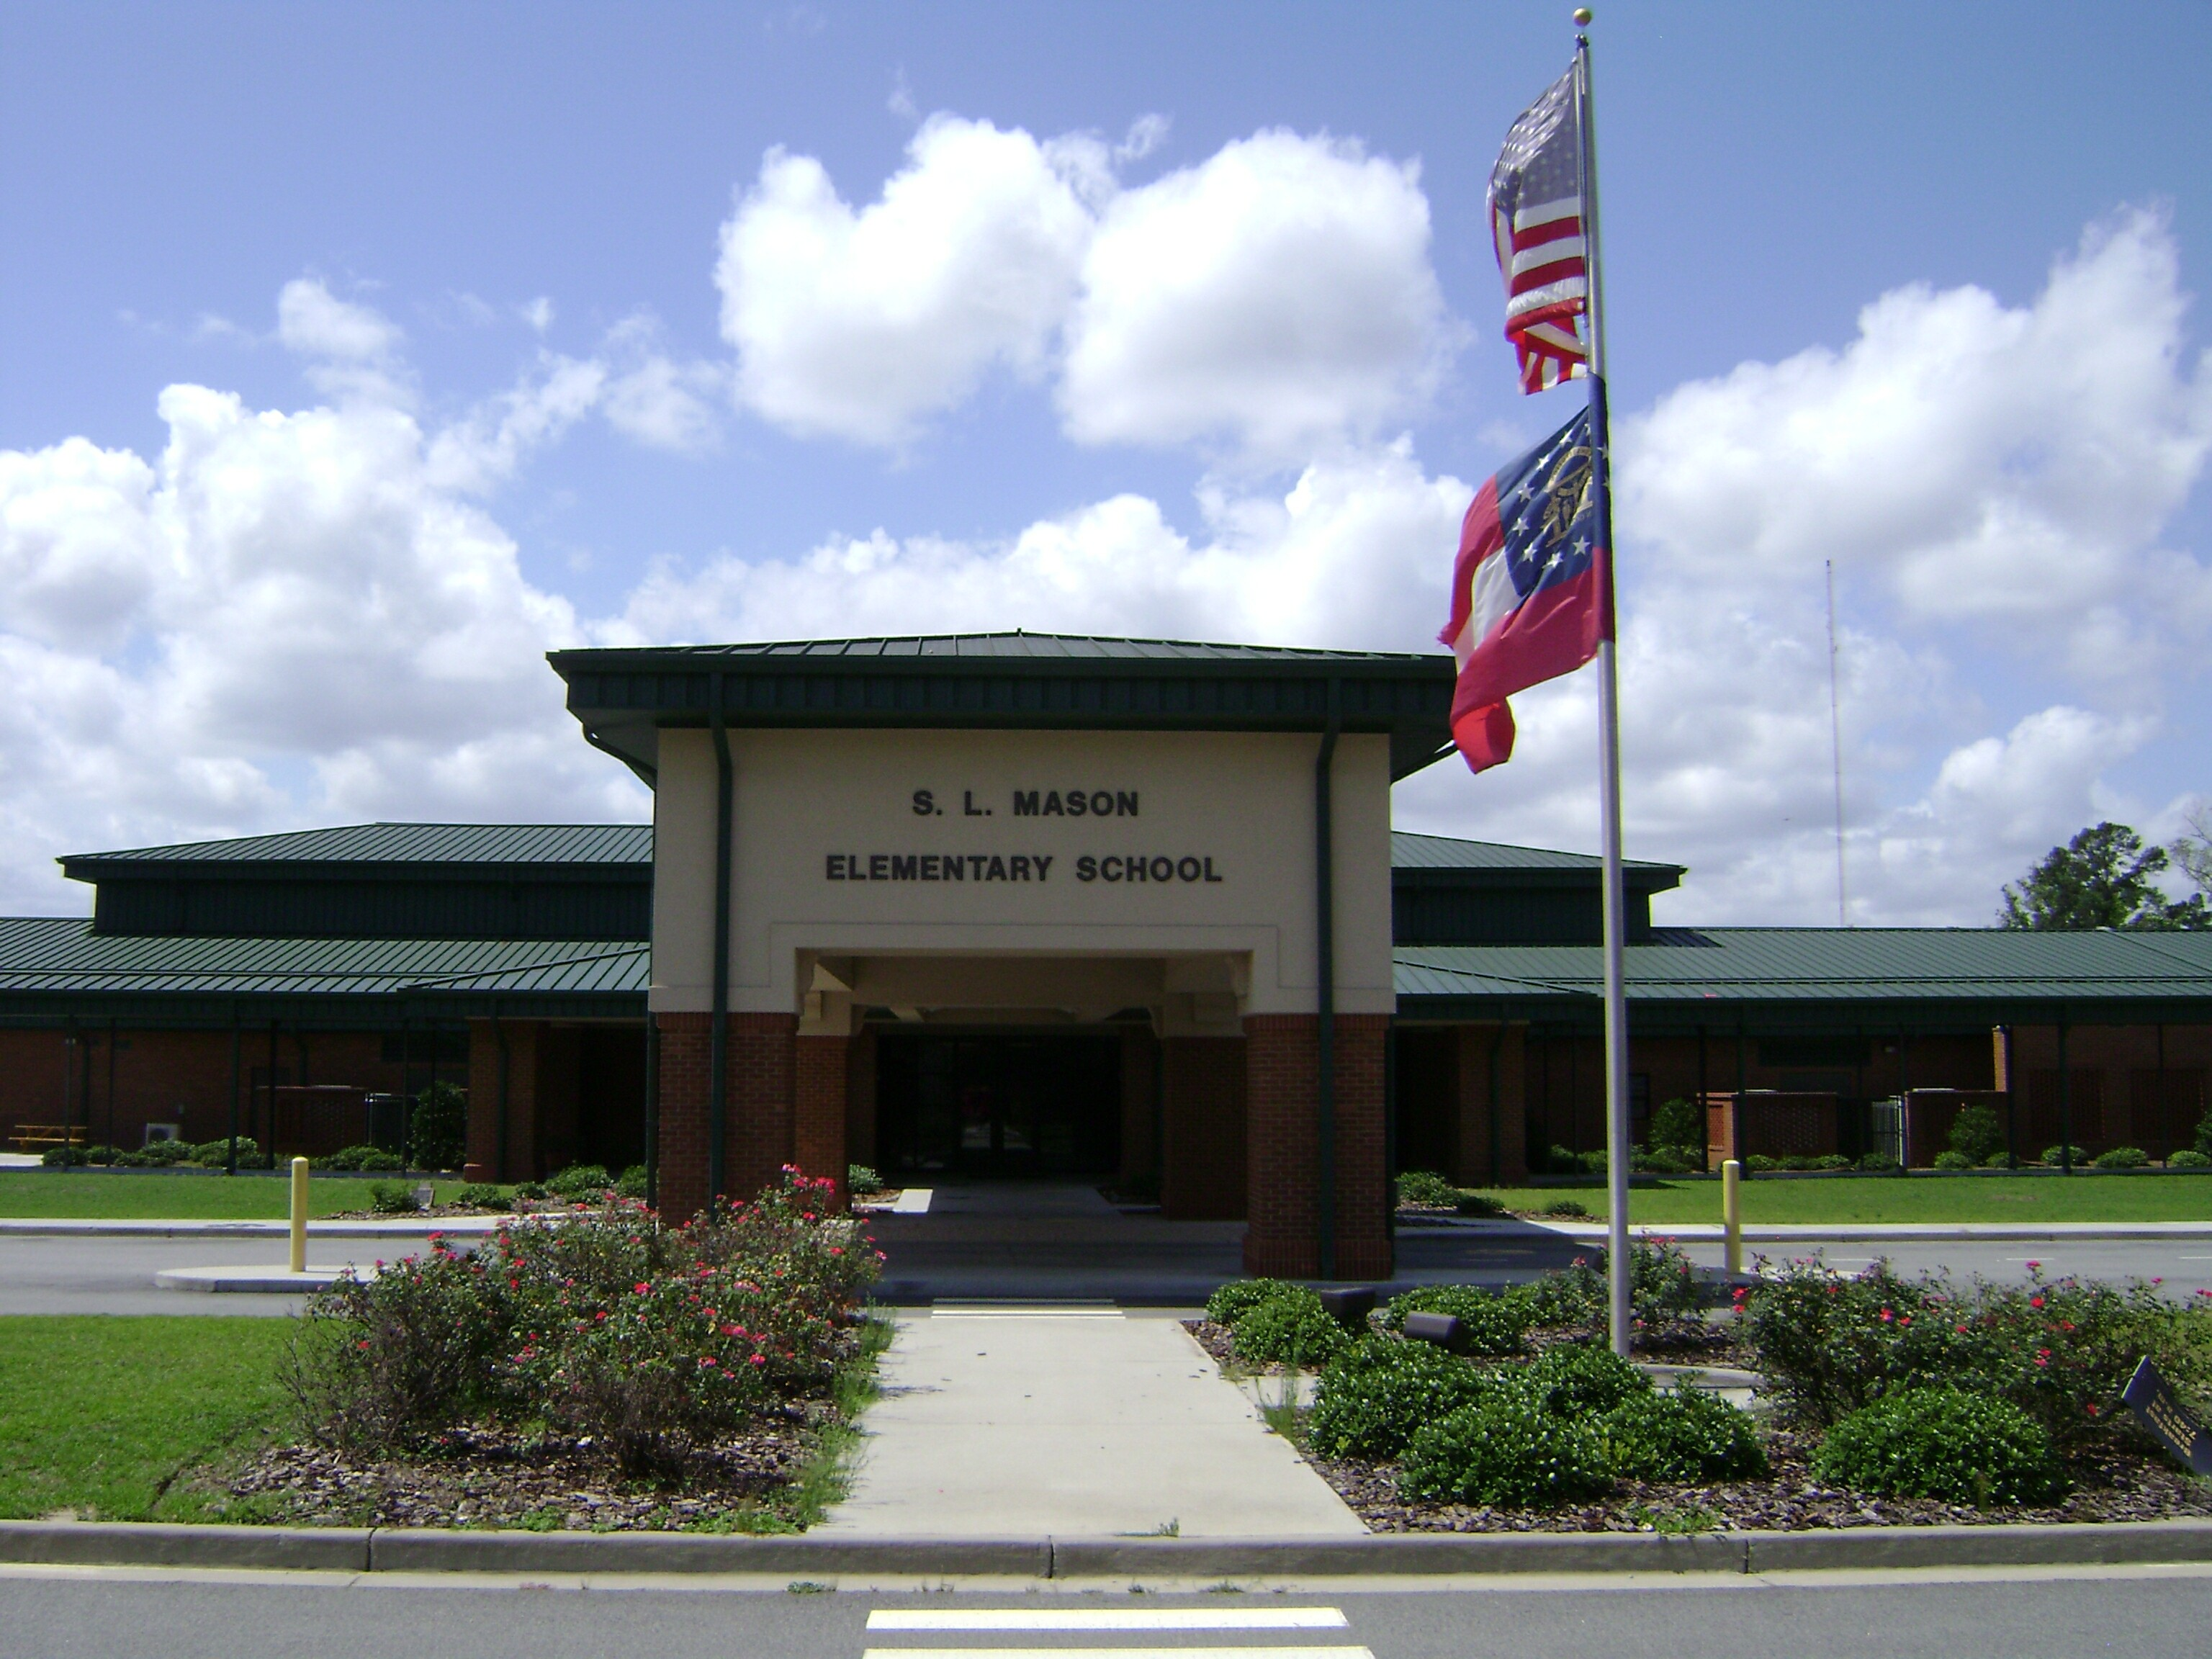 File:S L Mason Elementary School.jpg